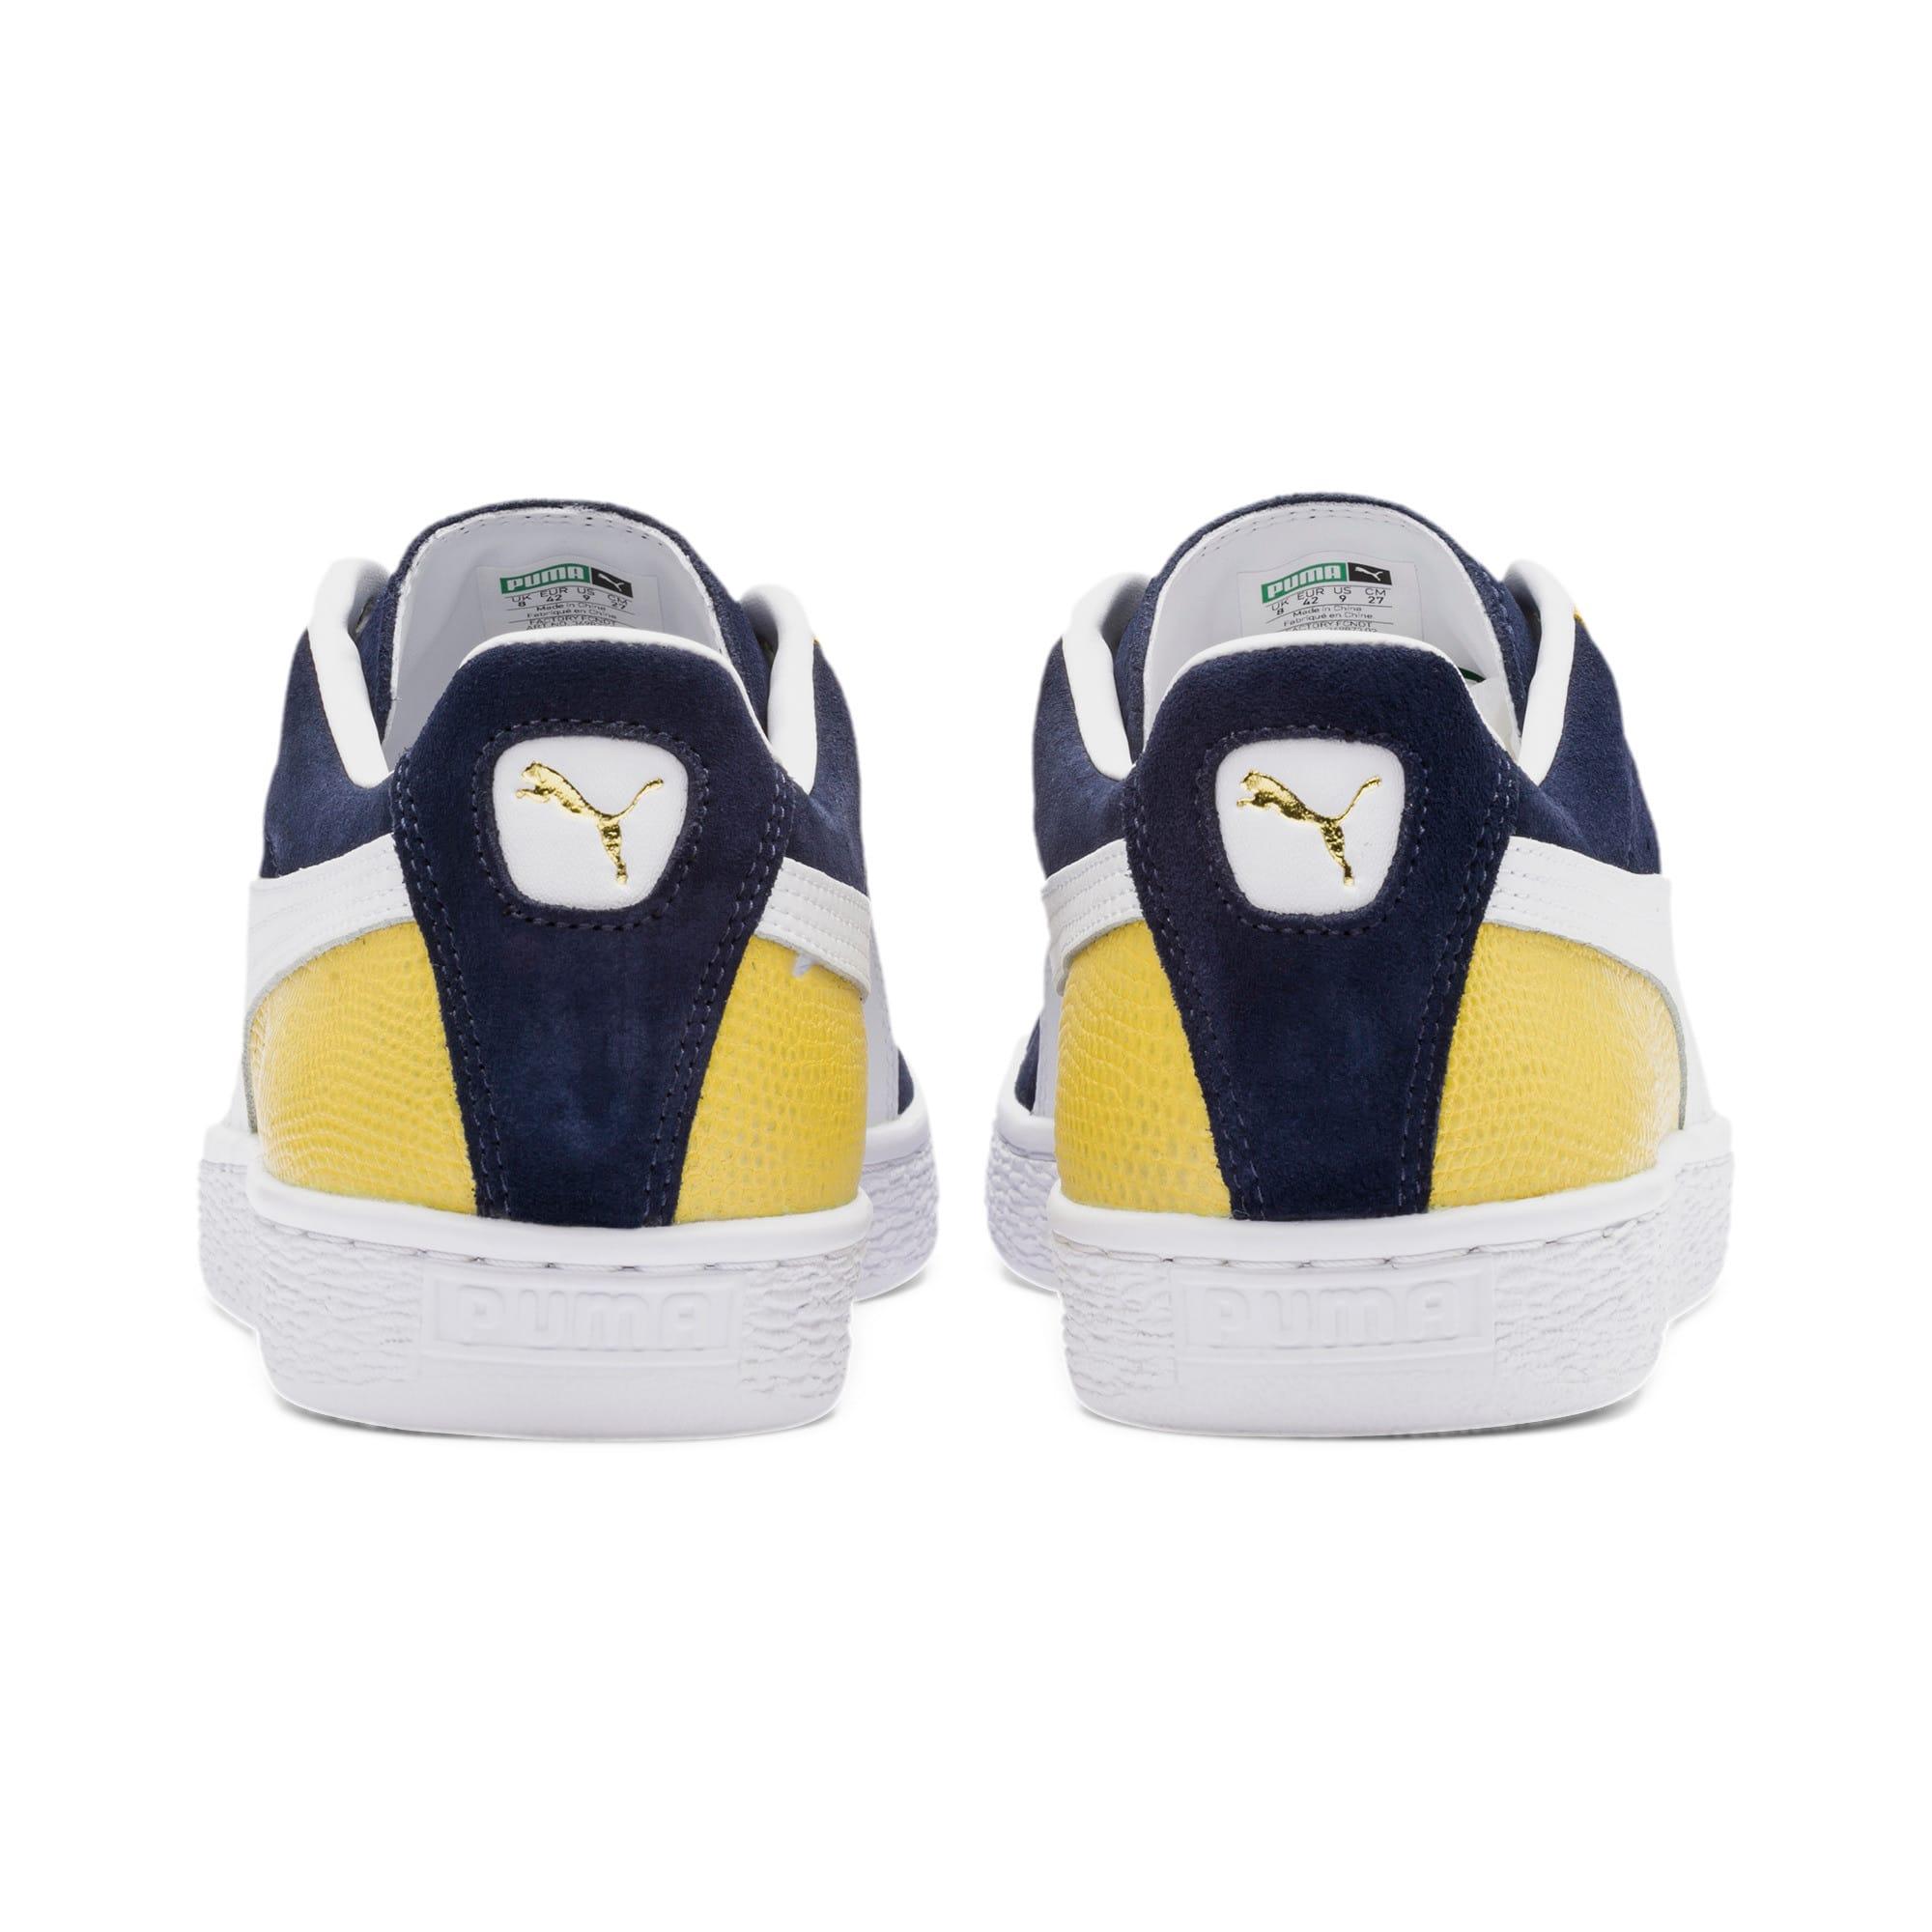 Miniatura 5 de Zapatos deportivos Suede Classic Block, Peacoat-Sulphur-Puma White, mediano